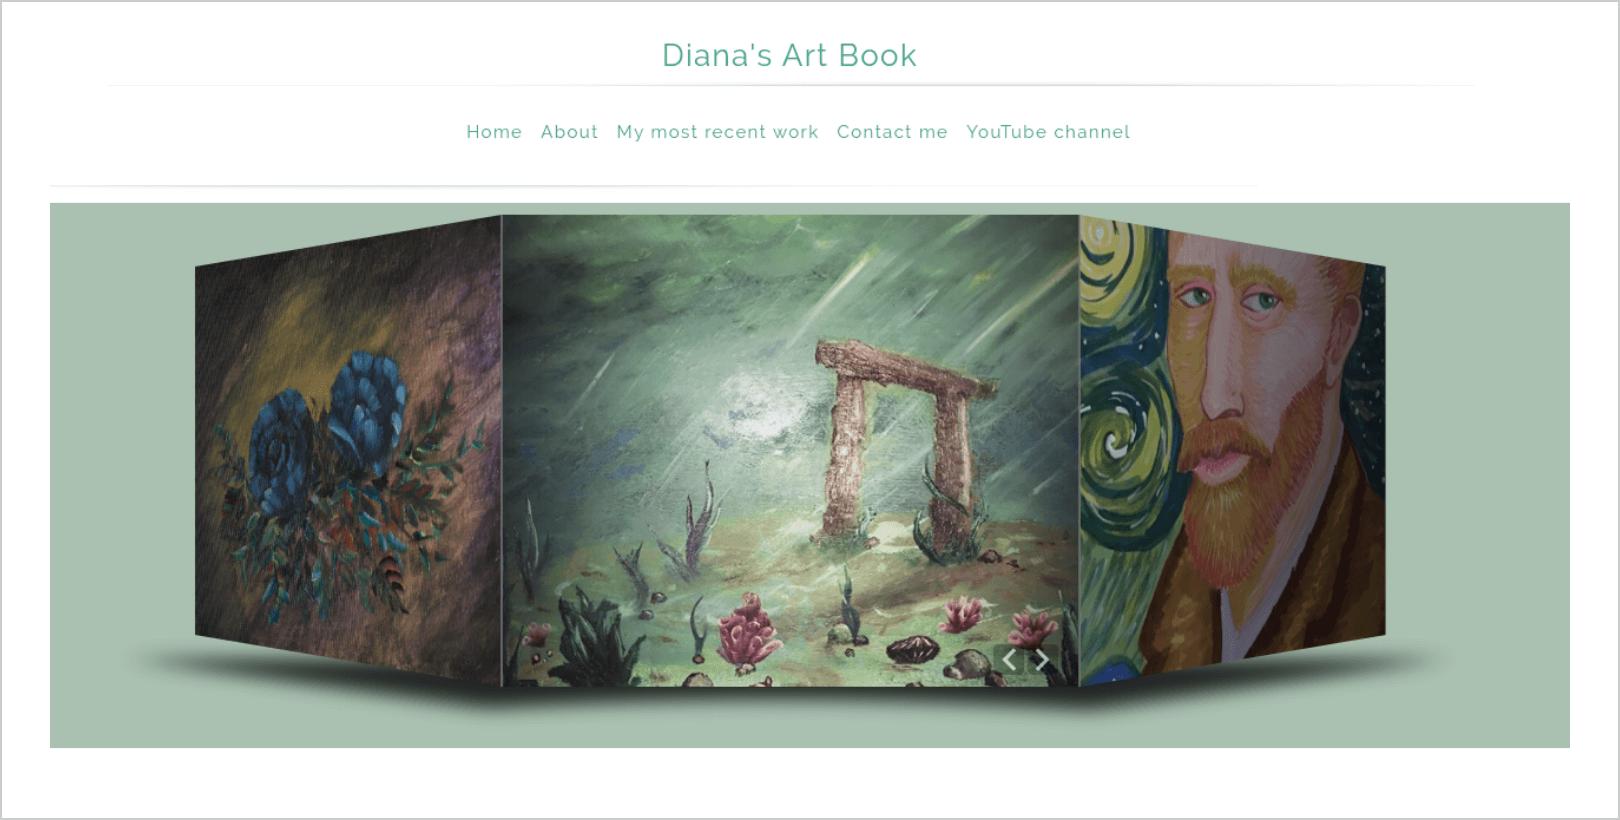 Diana's Art Book